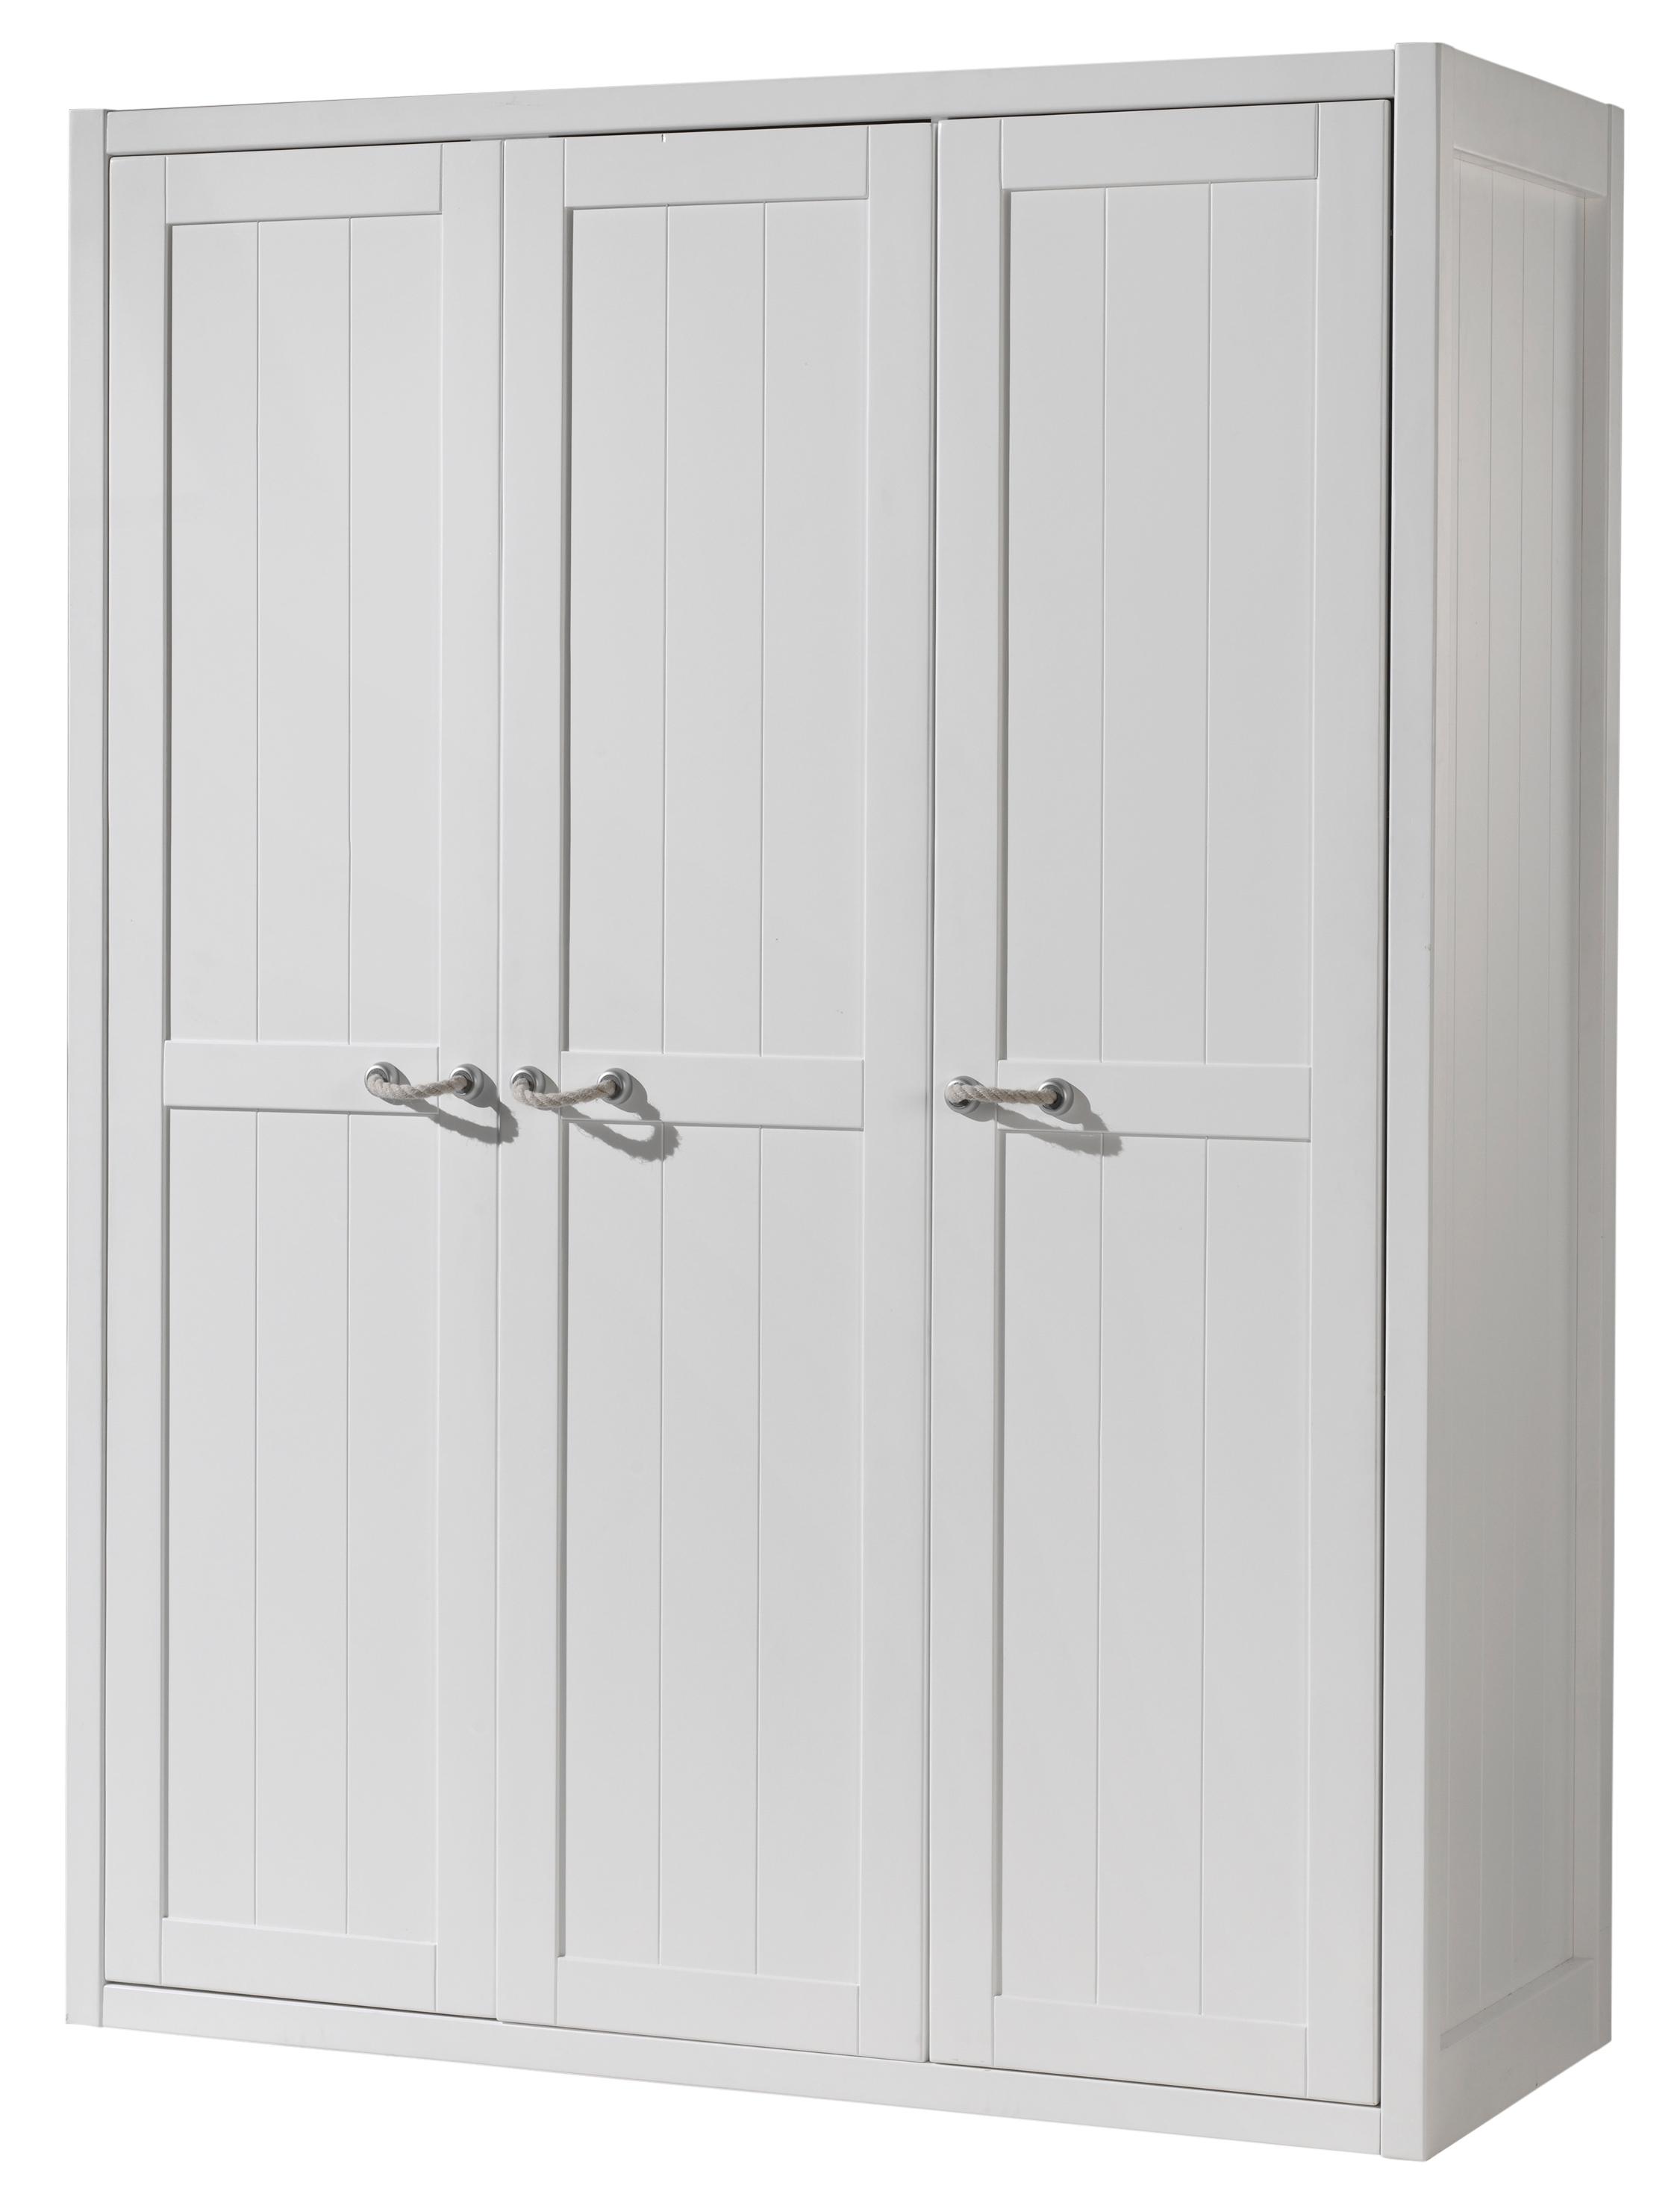 armoire 3 portes laqu e blanc marin. Black Bedroom Furniture Sets. Home Design Ideas